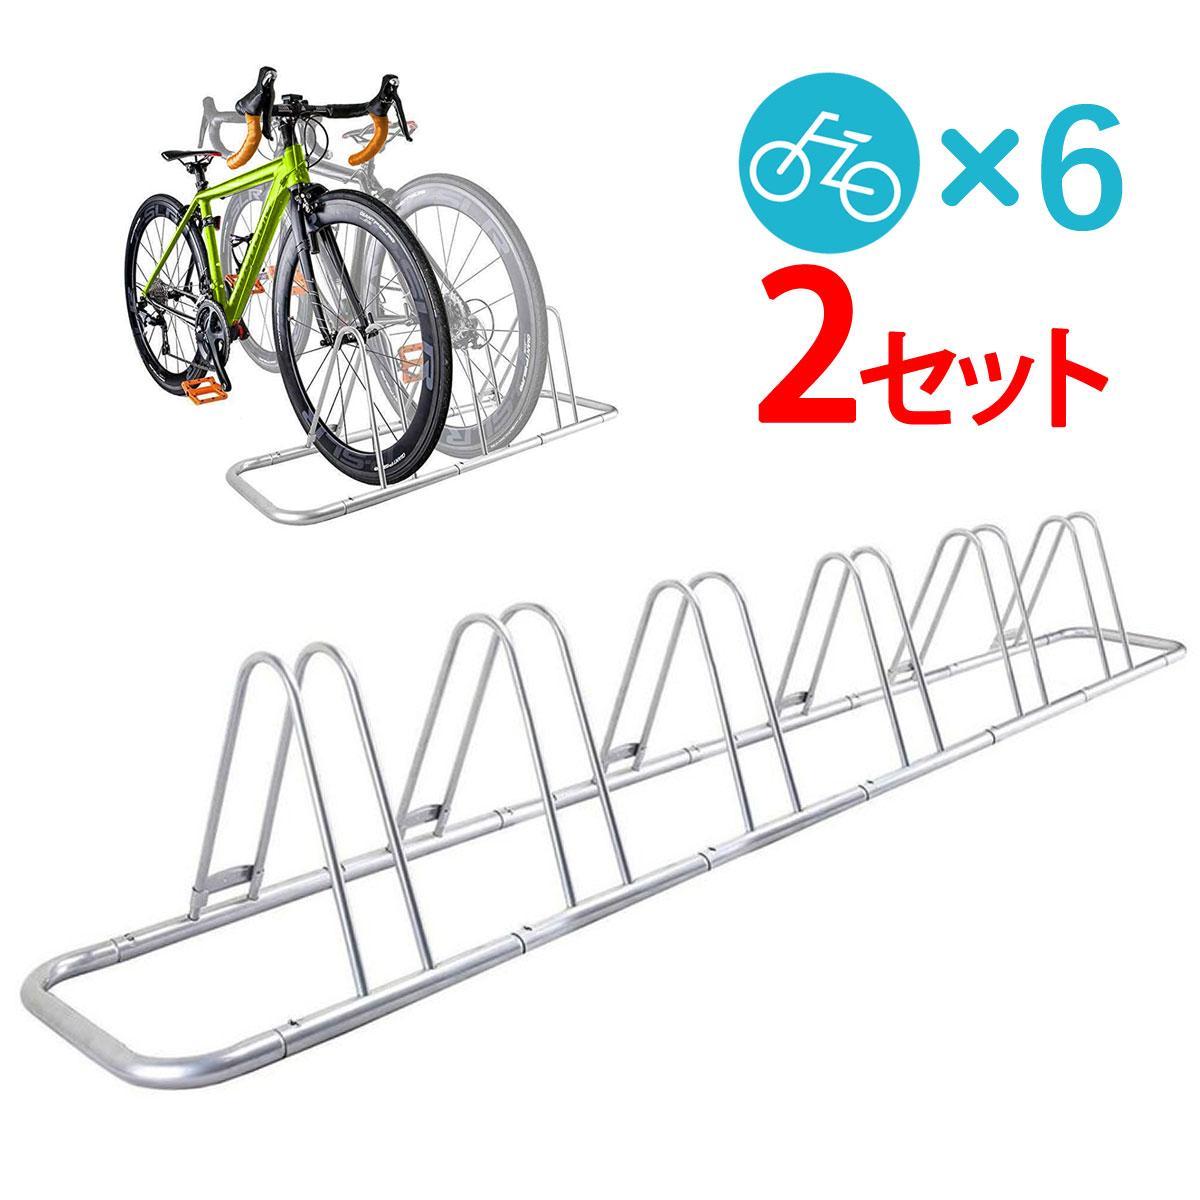 【B123】【2個セット】最大6台用自転車スタンド×2 NinoLite 直角 又は 斜め収納でスペース節約!自転車の多い方 会社用 店舗用にも大活躍! バイクスタンド サイクルパーキングラック 自転車ラック サイクルラック 駐輪ラック 斜め置きにもアレンジ可能 最大12台